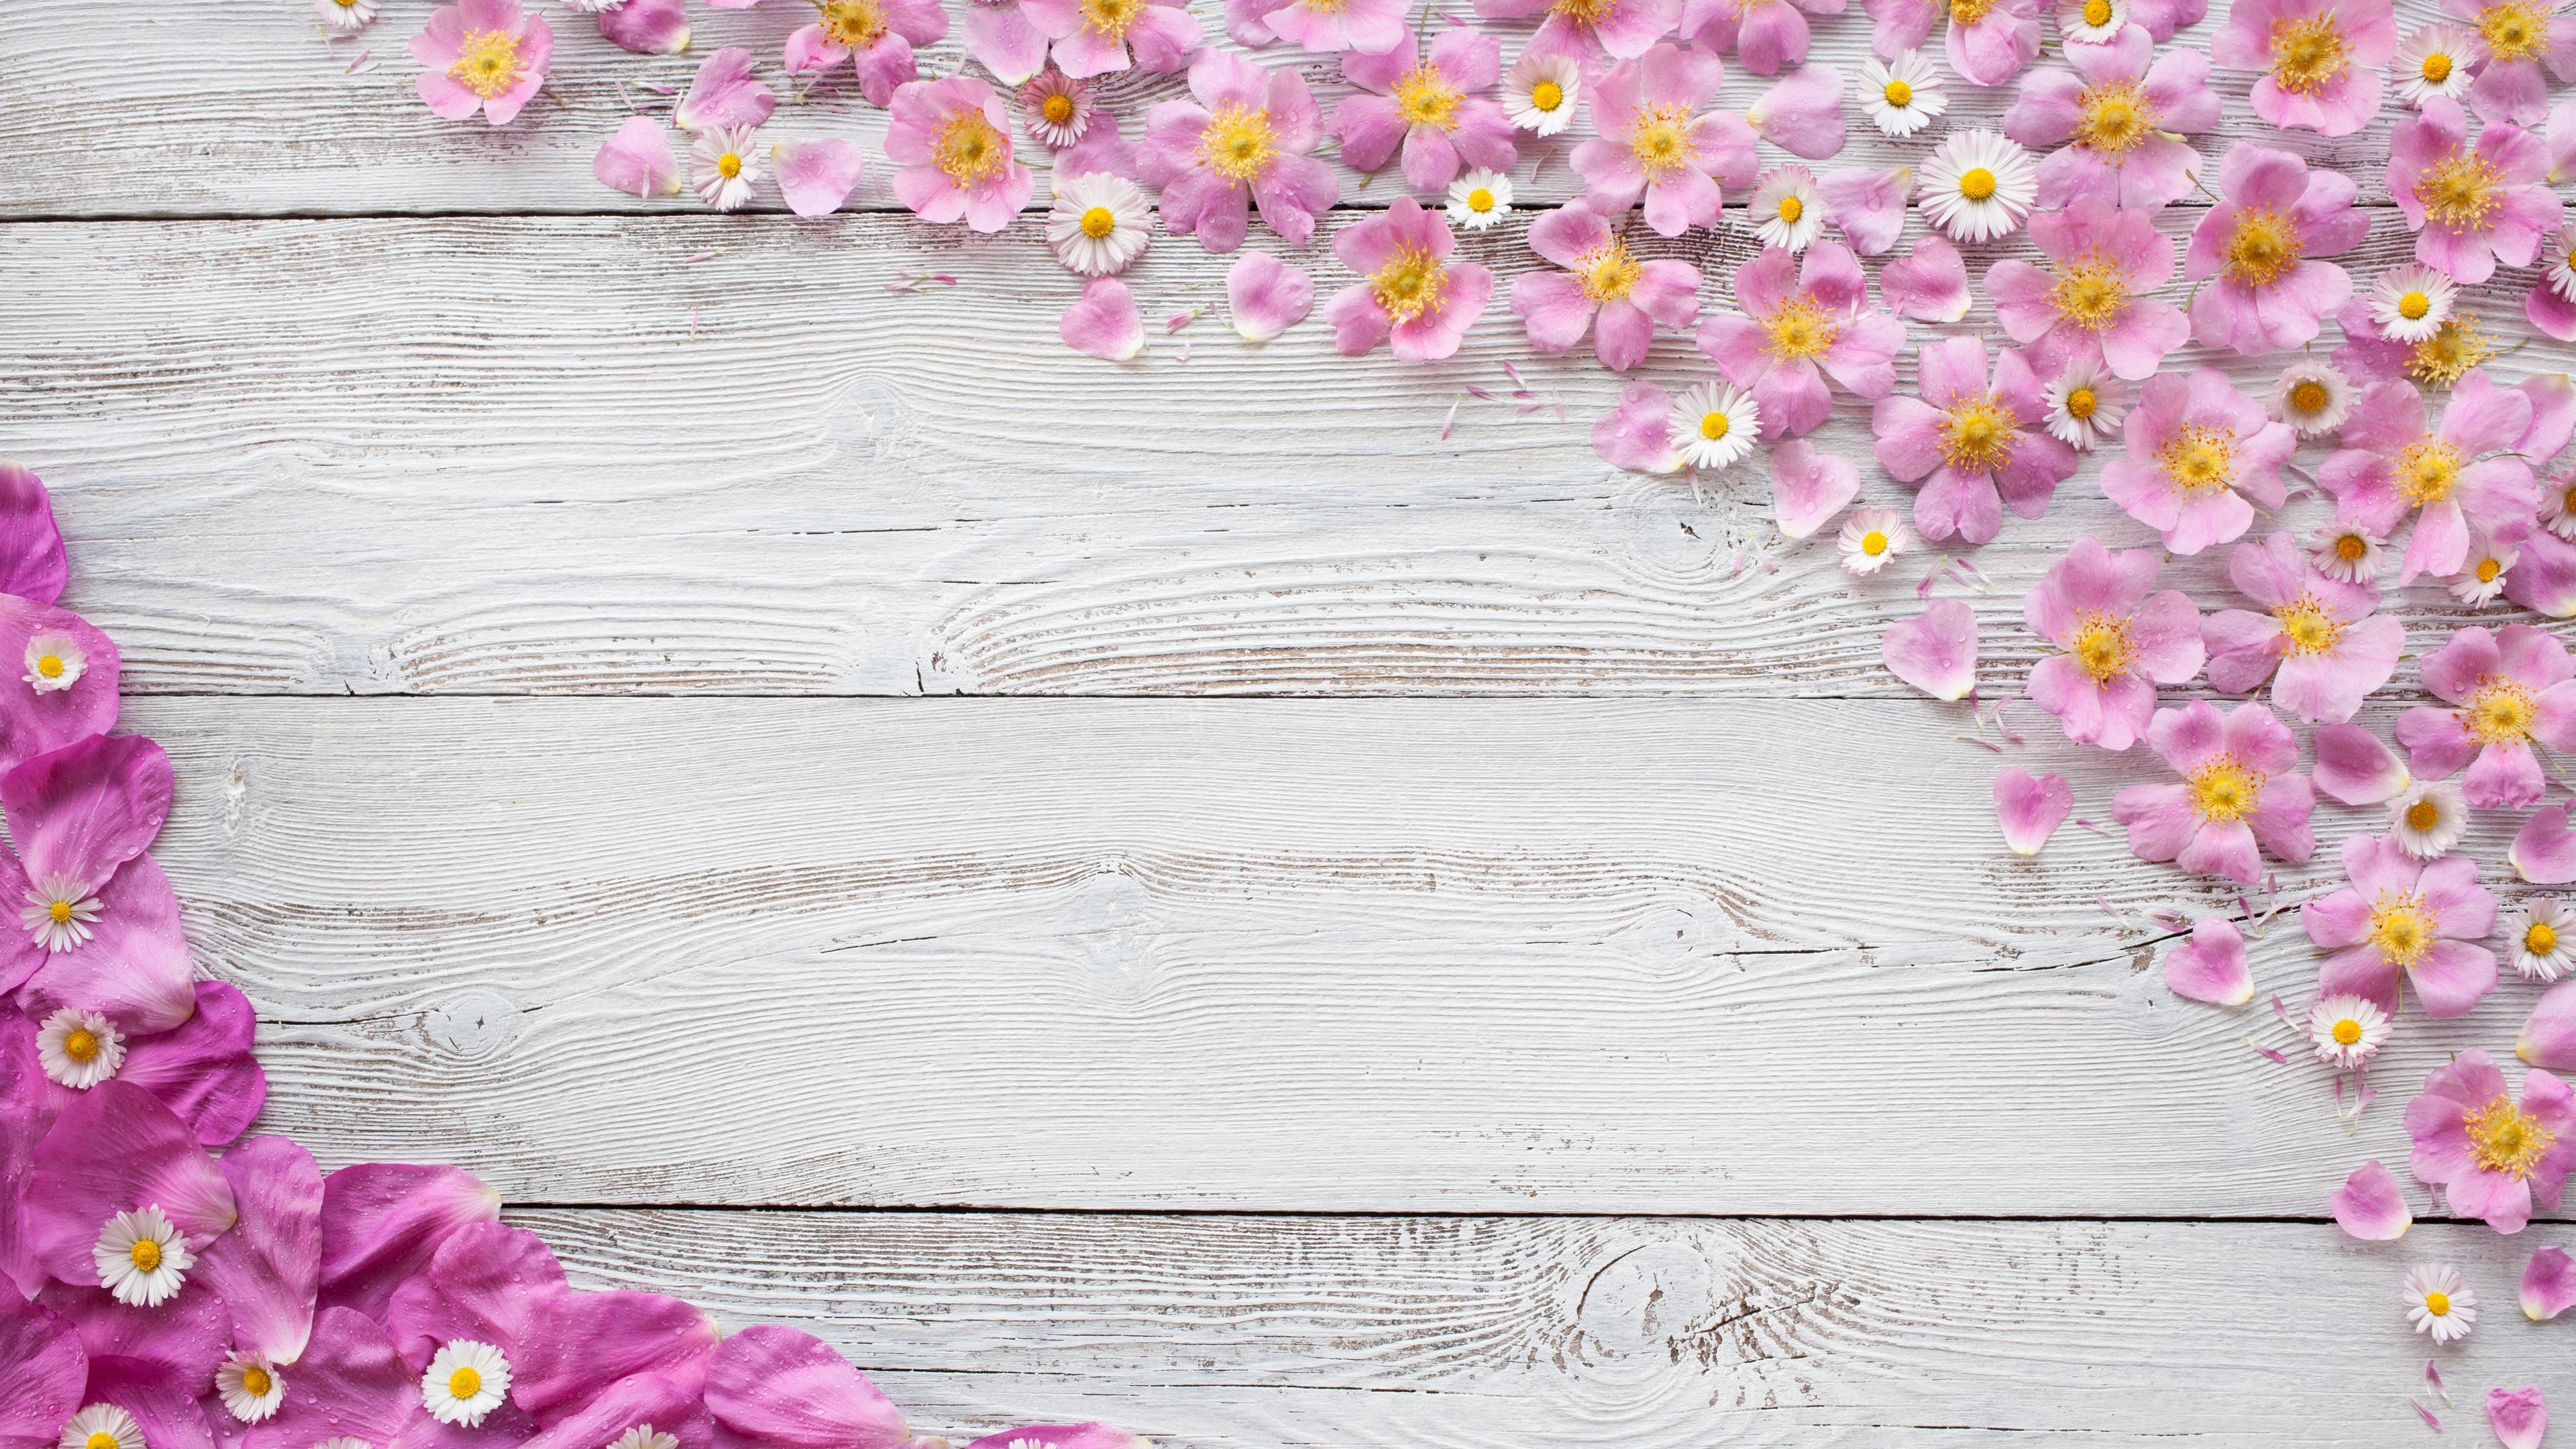 Fondos De Pantalla Fondo De Tablero De Madera De Colores: Fondos De Pantalla Flores, Pétalos De Rosa, Gotas De Agua